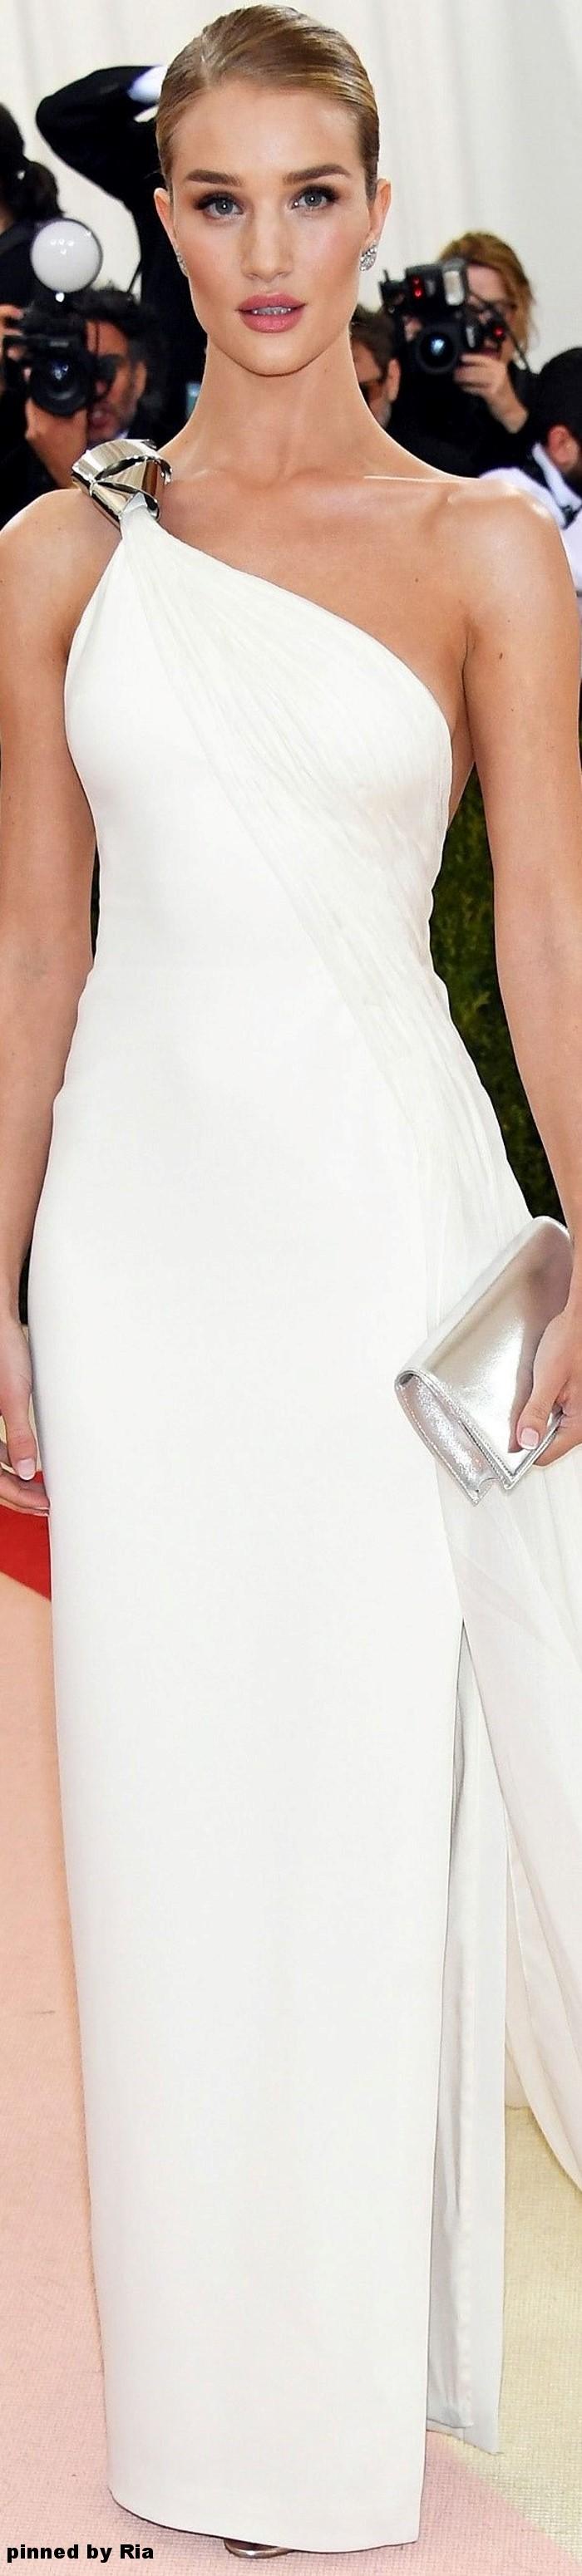 Rosie Huntington Whiteley in Ralph Lauren l Met Gala 2016 l Ria